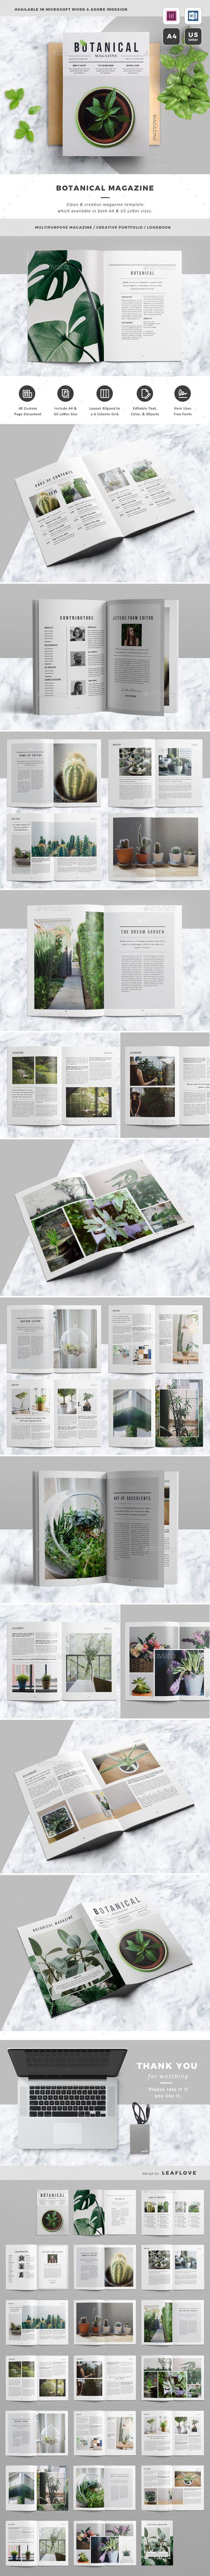 Botanical Magazine. Download: https://graphicriver.net/item/magazine/19260192?ref=thanhdesign